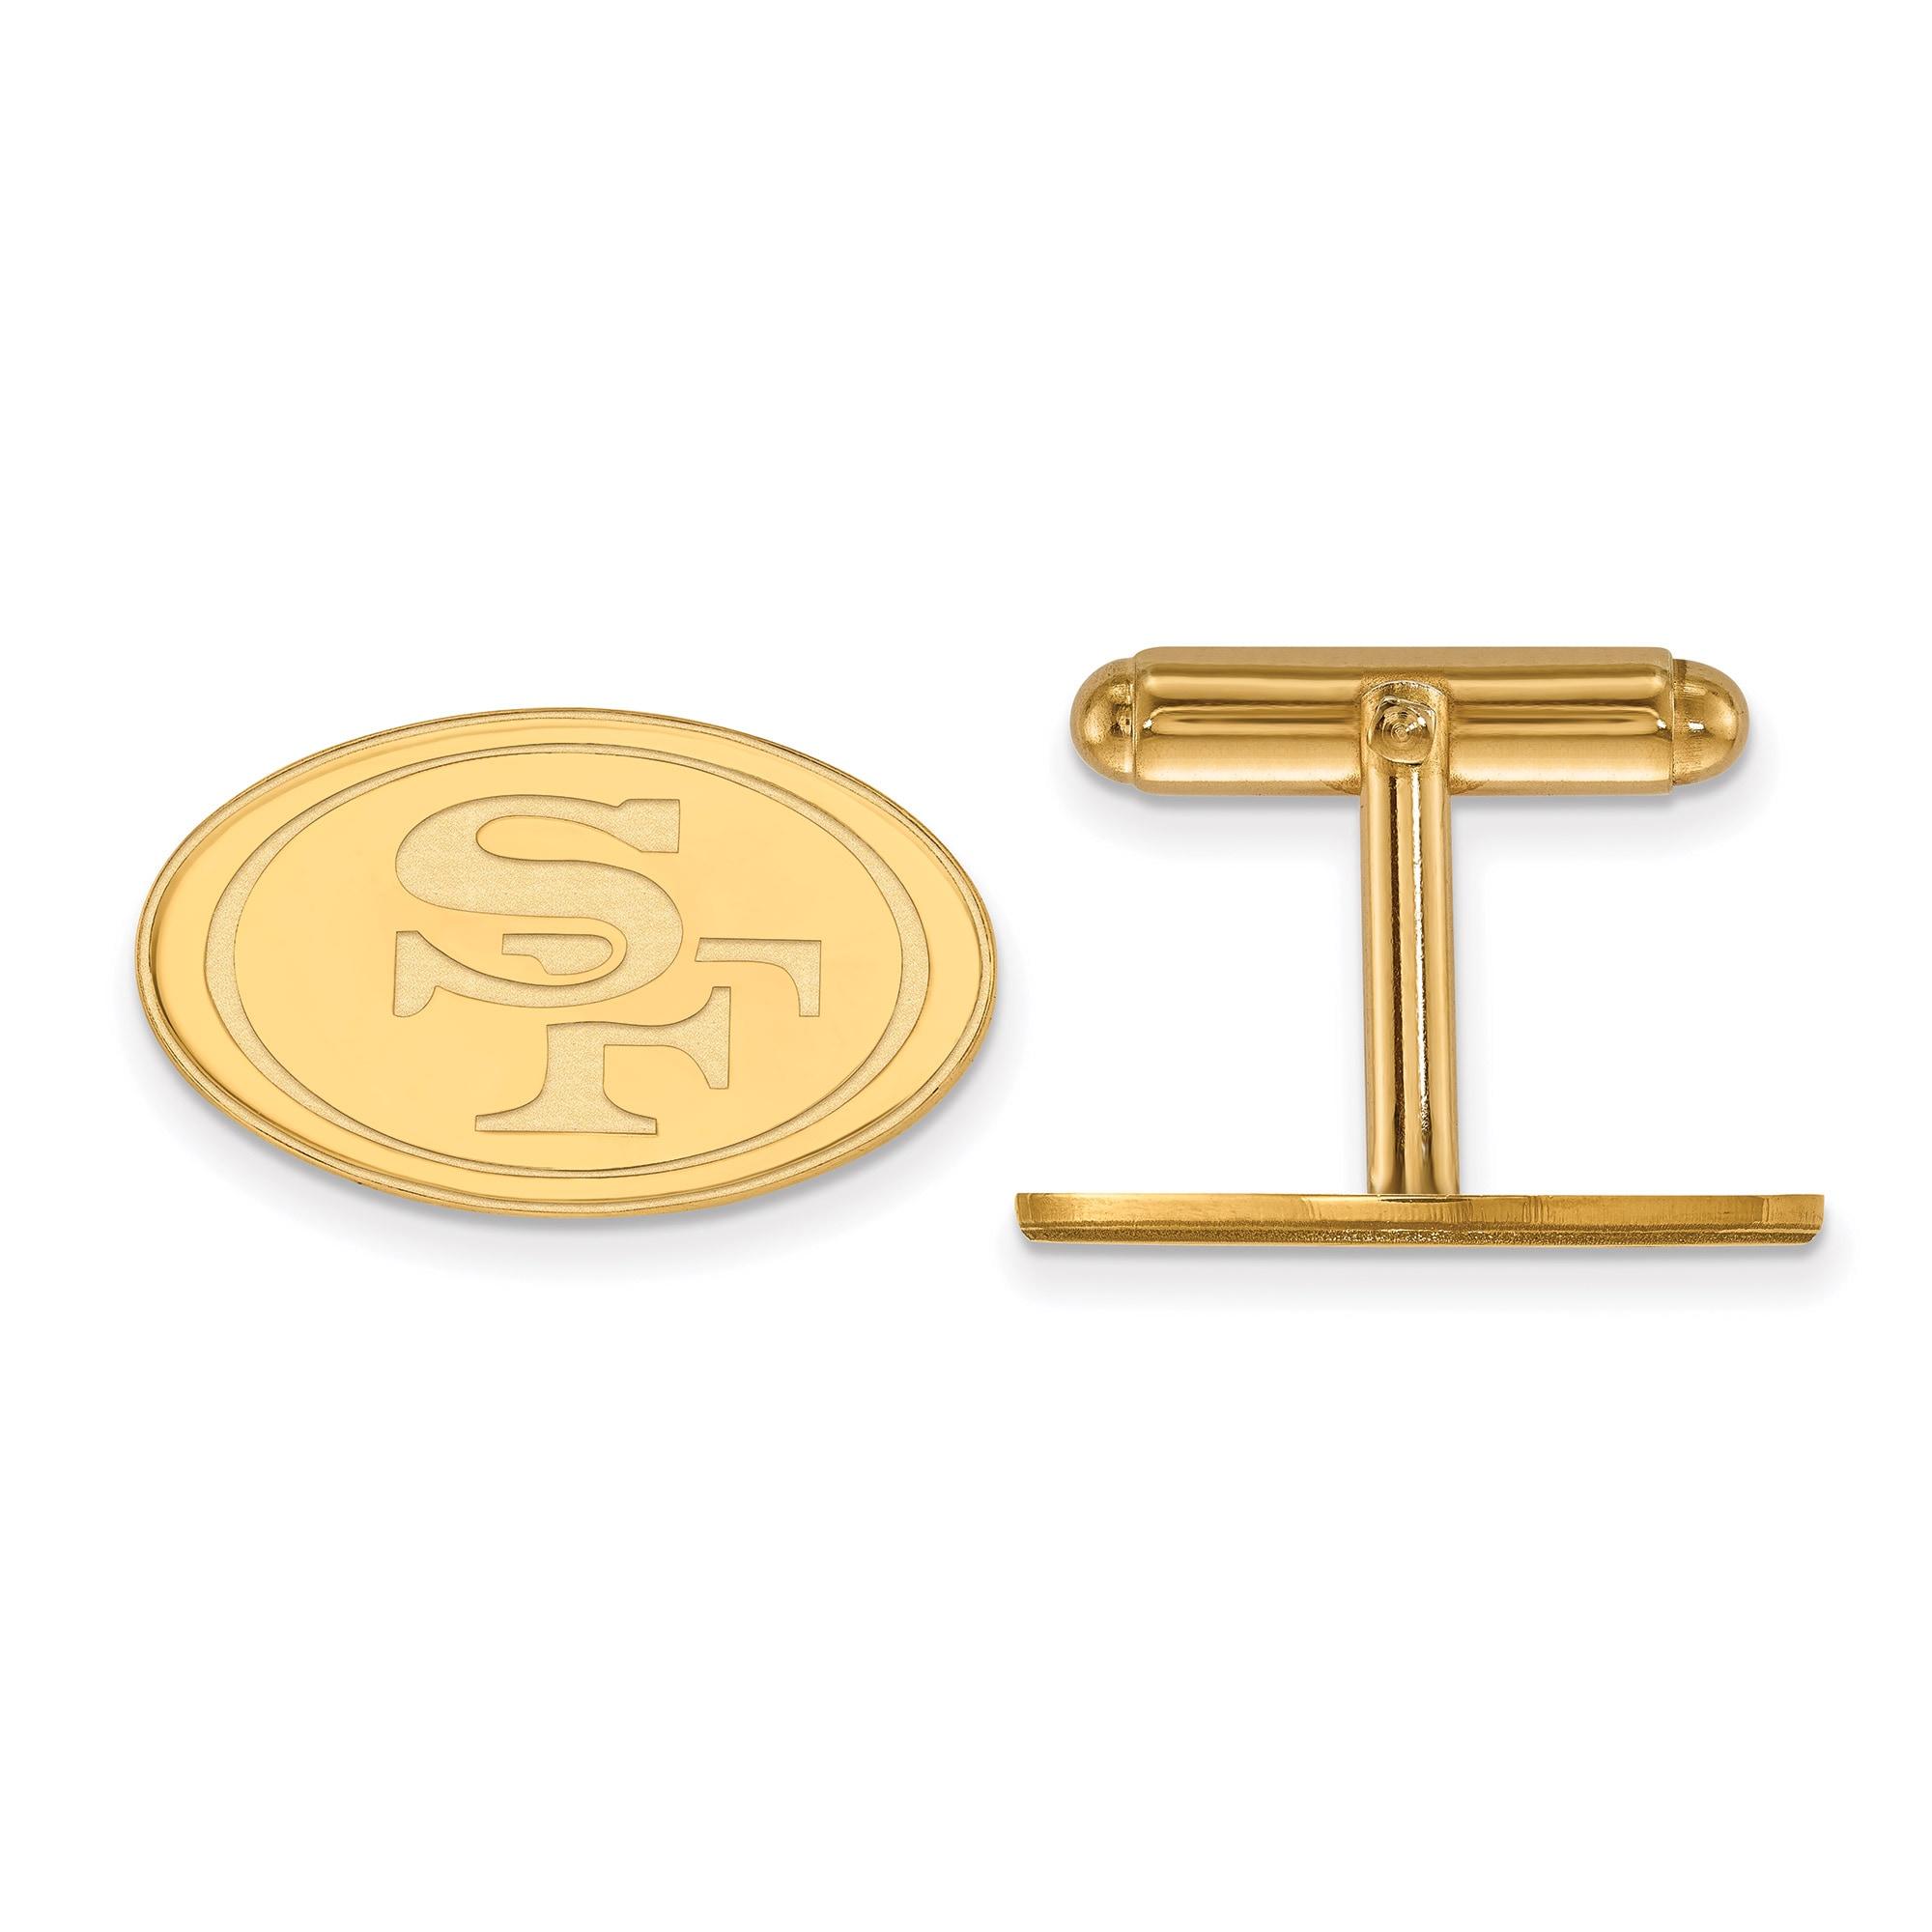 San Francisco 49ers Gold-Plated Logo Cufflinks